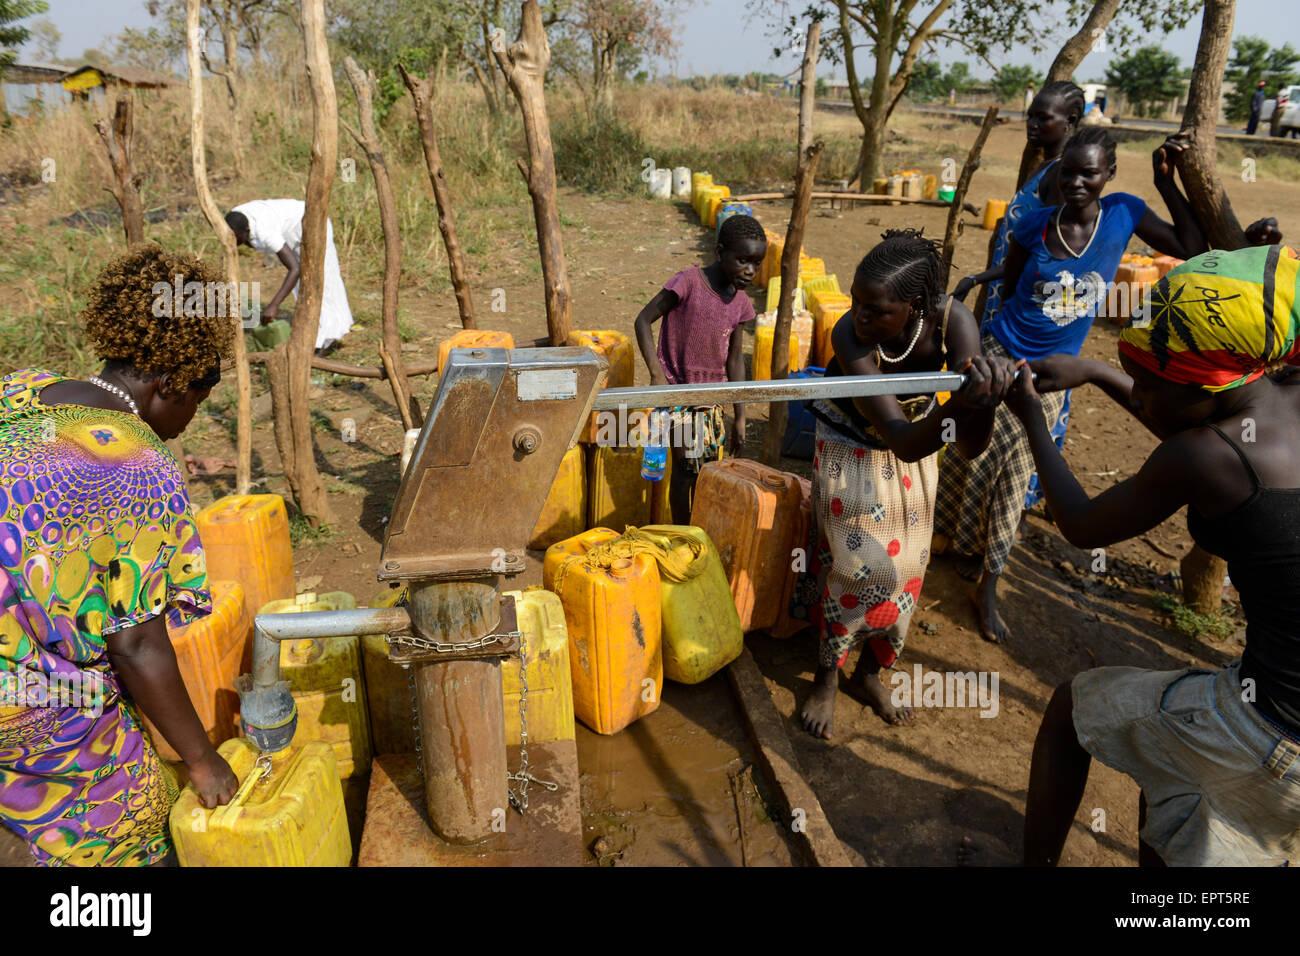 ETHIOPIA Gambela, hand pump set for water supply in village / AETHIOPIEN Gambela, Handpumpe fuer Trinkwasser Versorgung Stock Photo